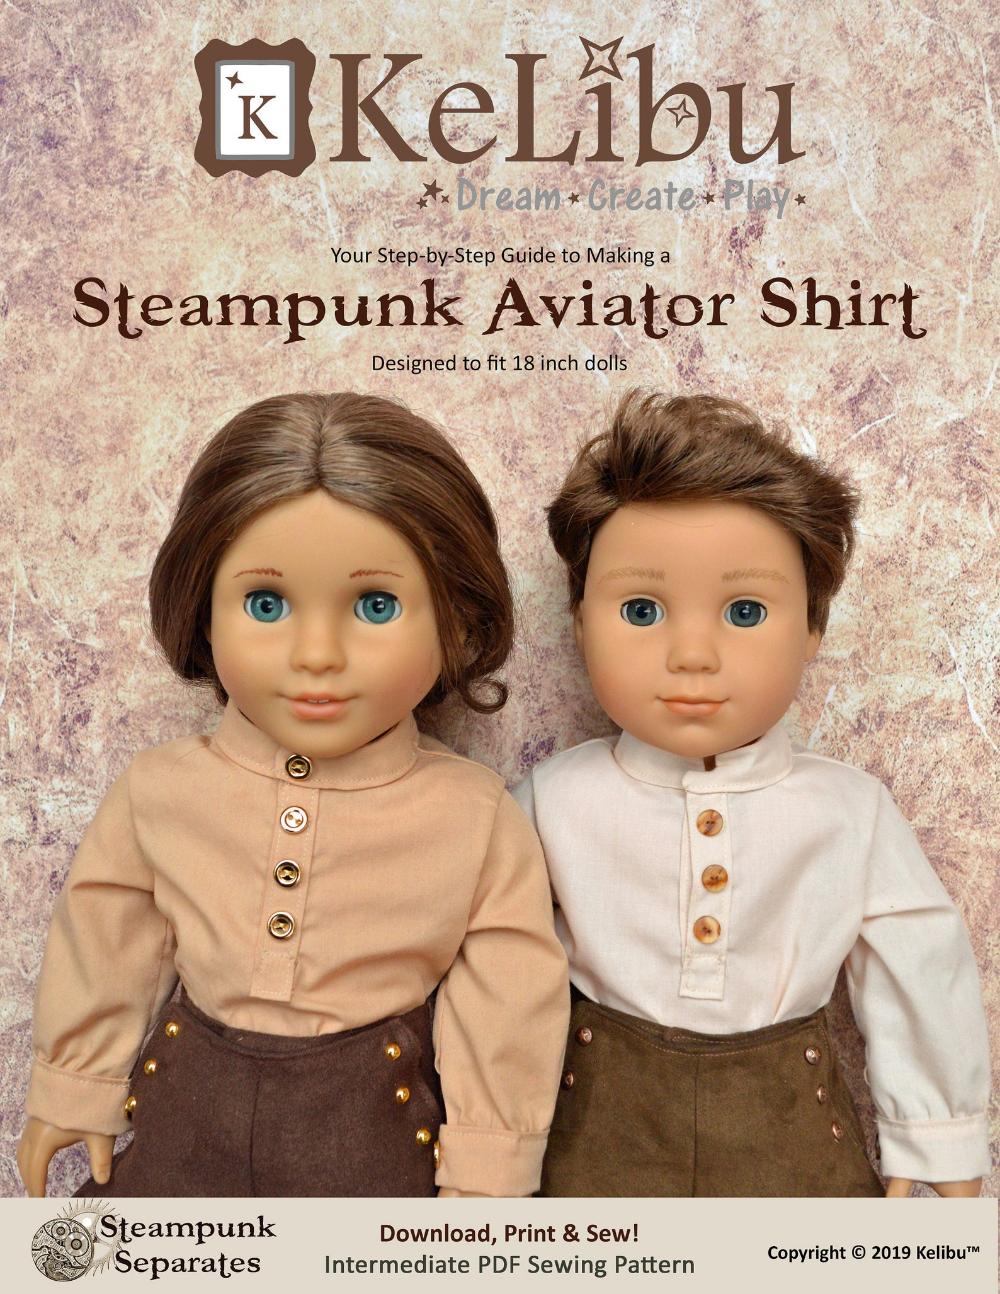 Steampunk Aviator Shirt for 18 inch dolls